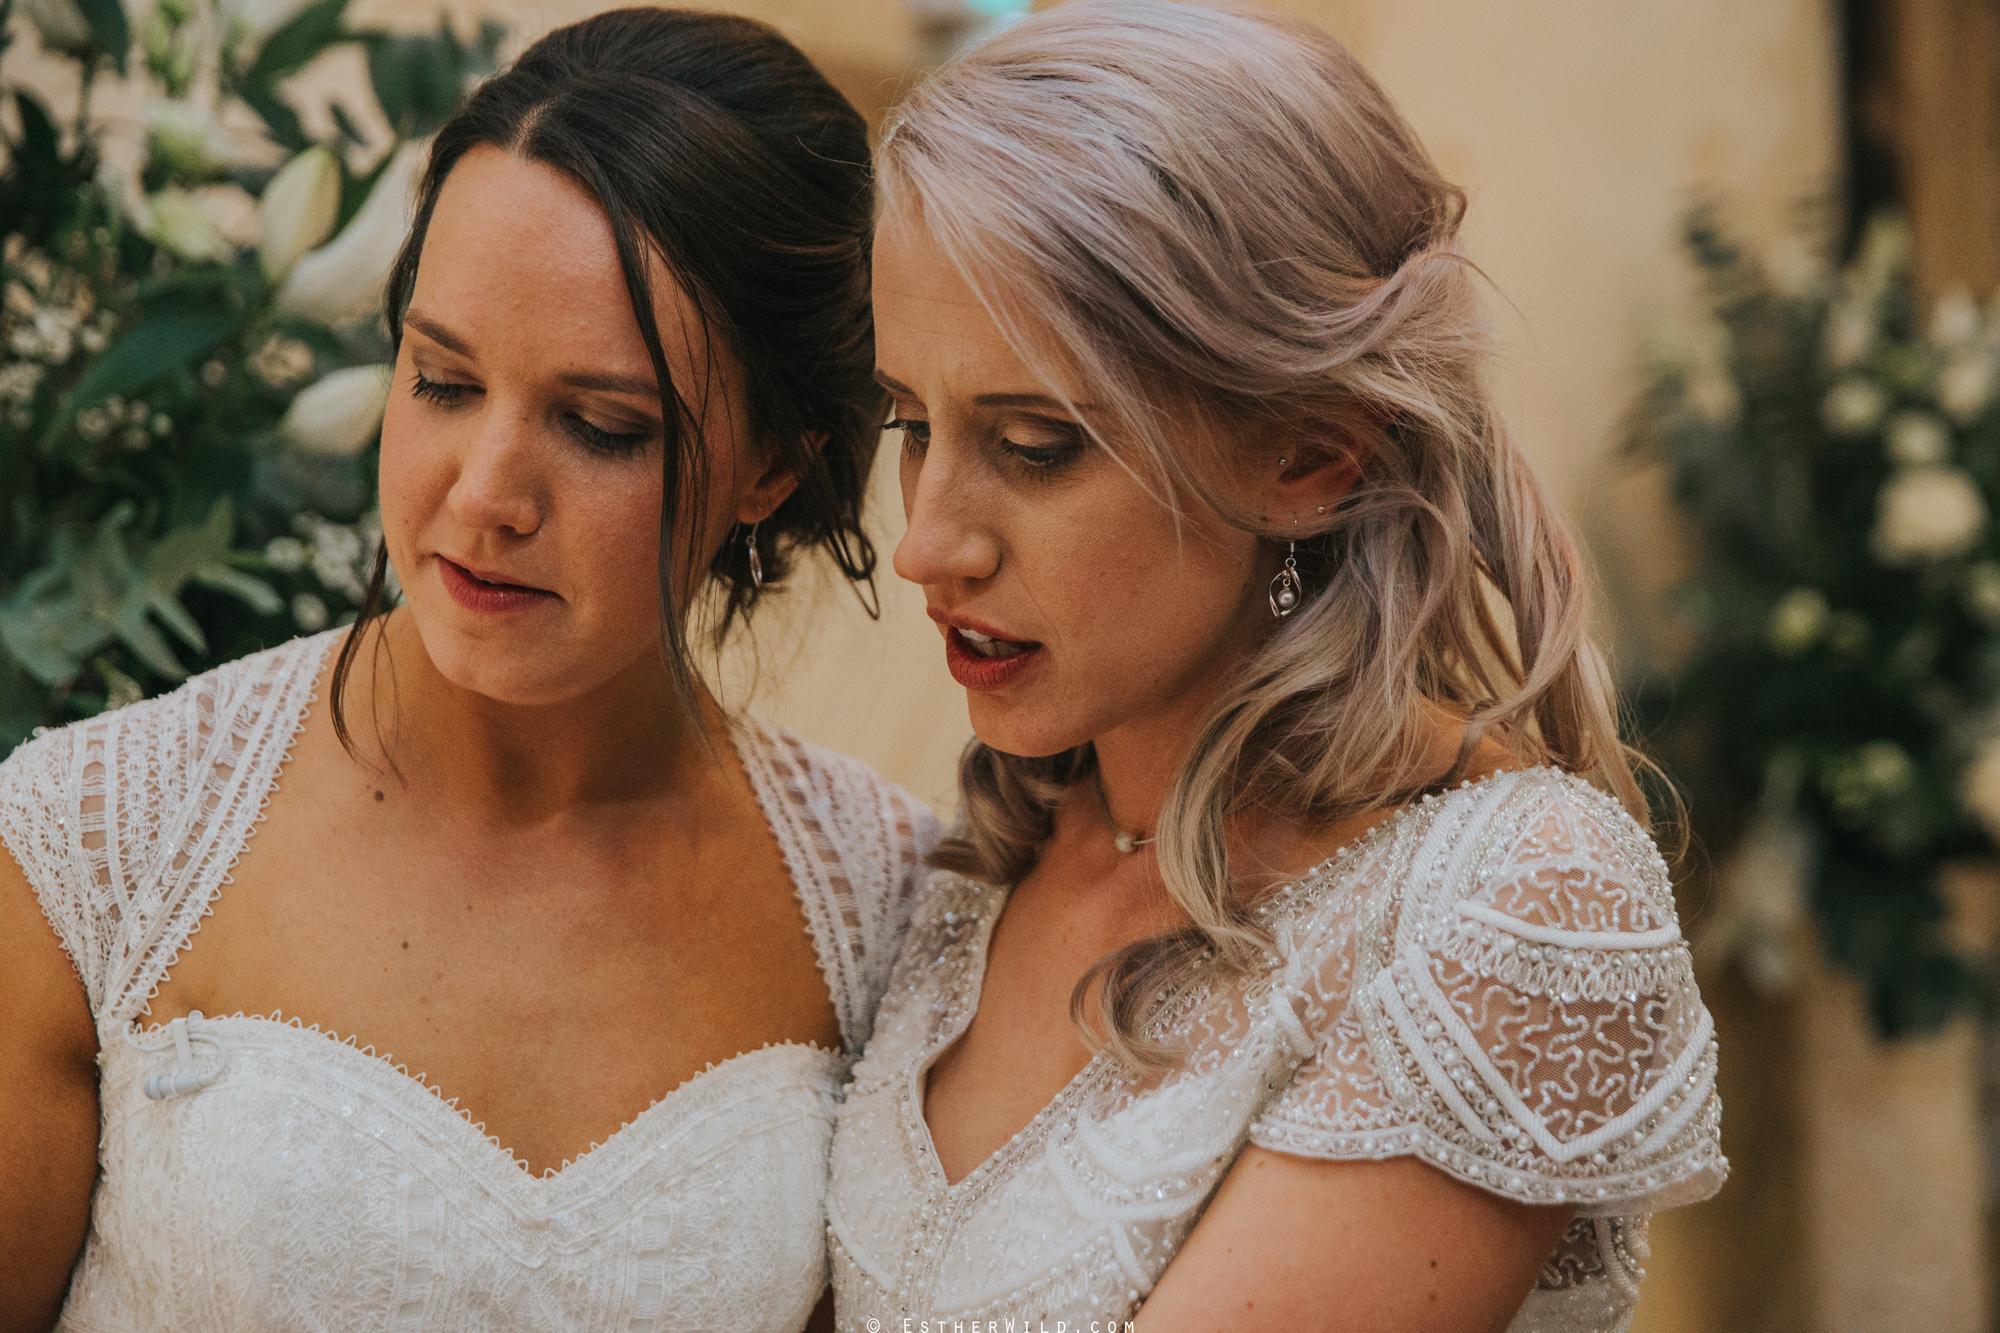 Elms_Barn_Weddings_Suffolk_Photographer_Copyright_Esther_Wild_IMG_2440.jpg